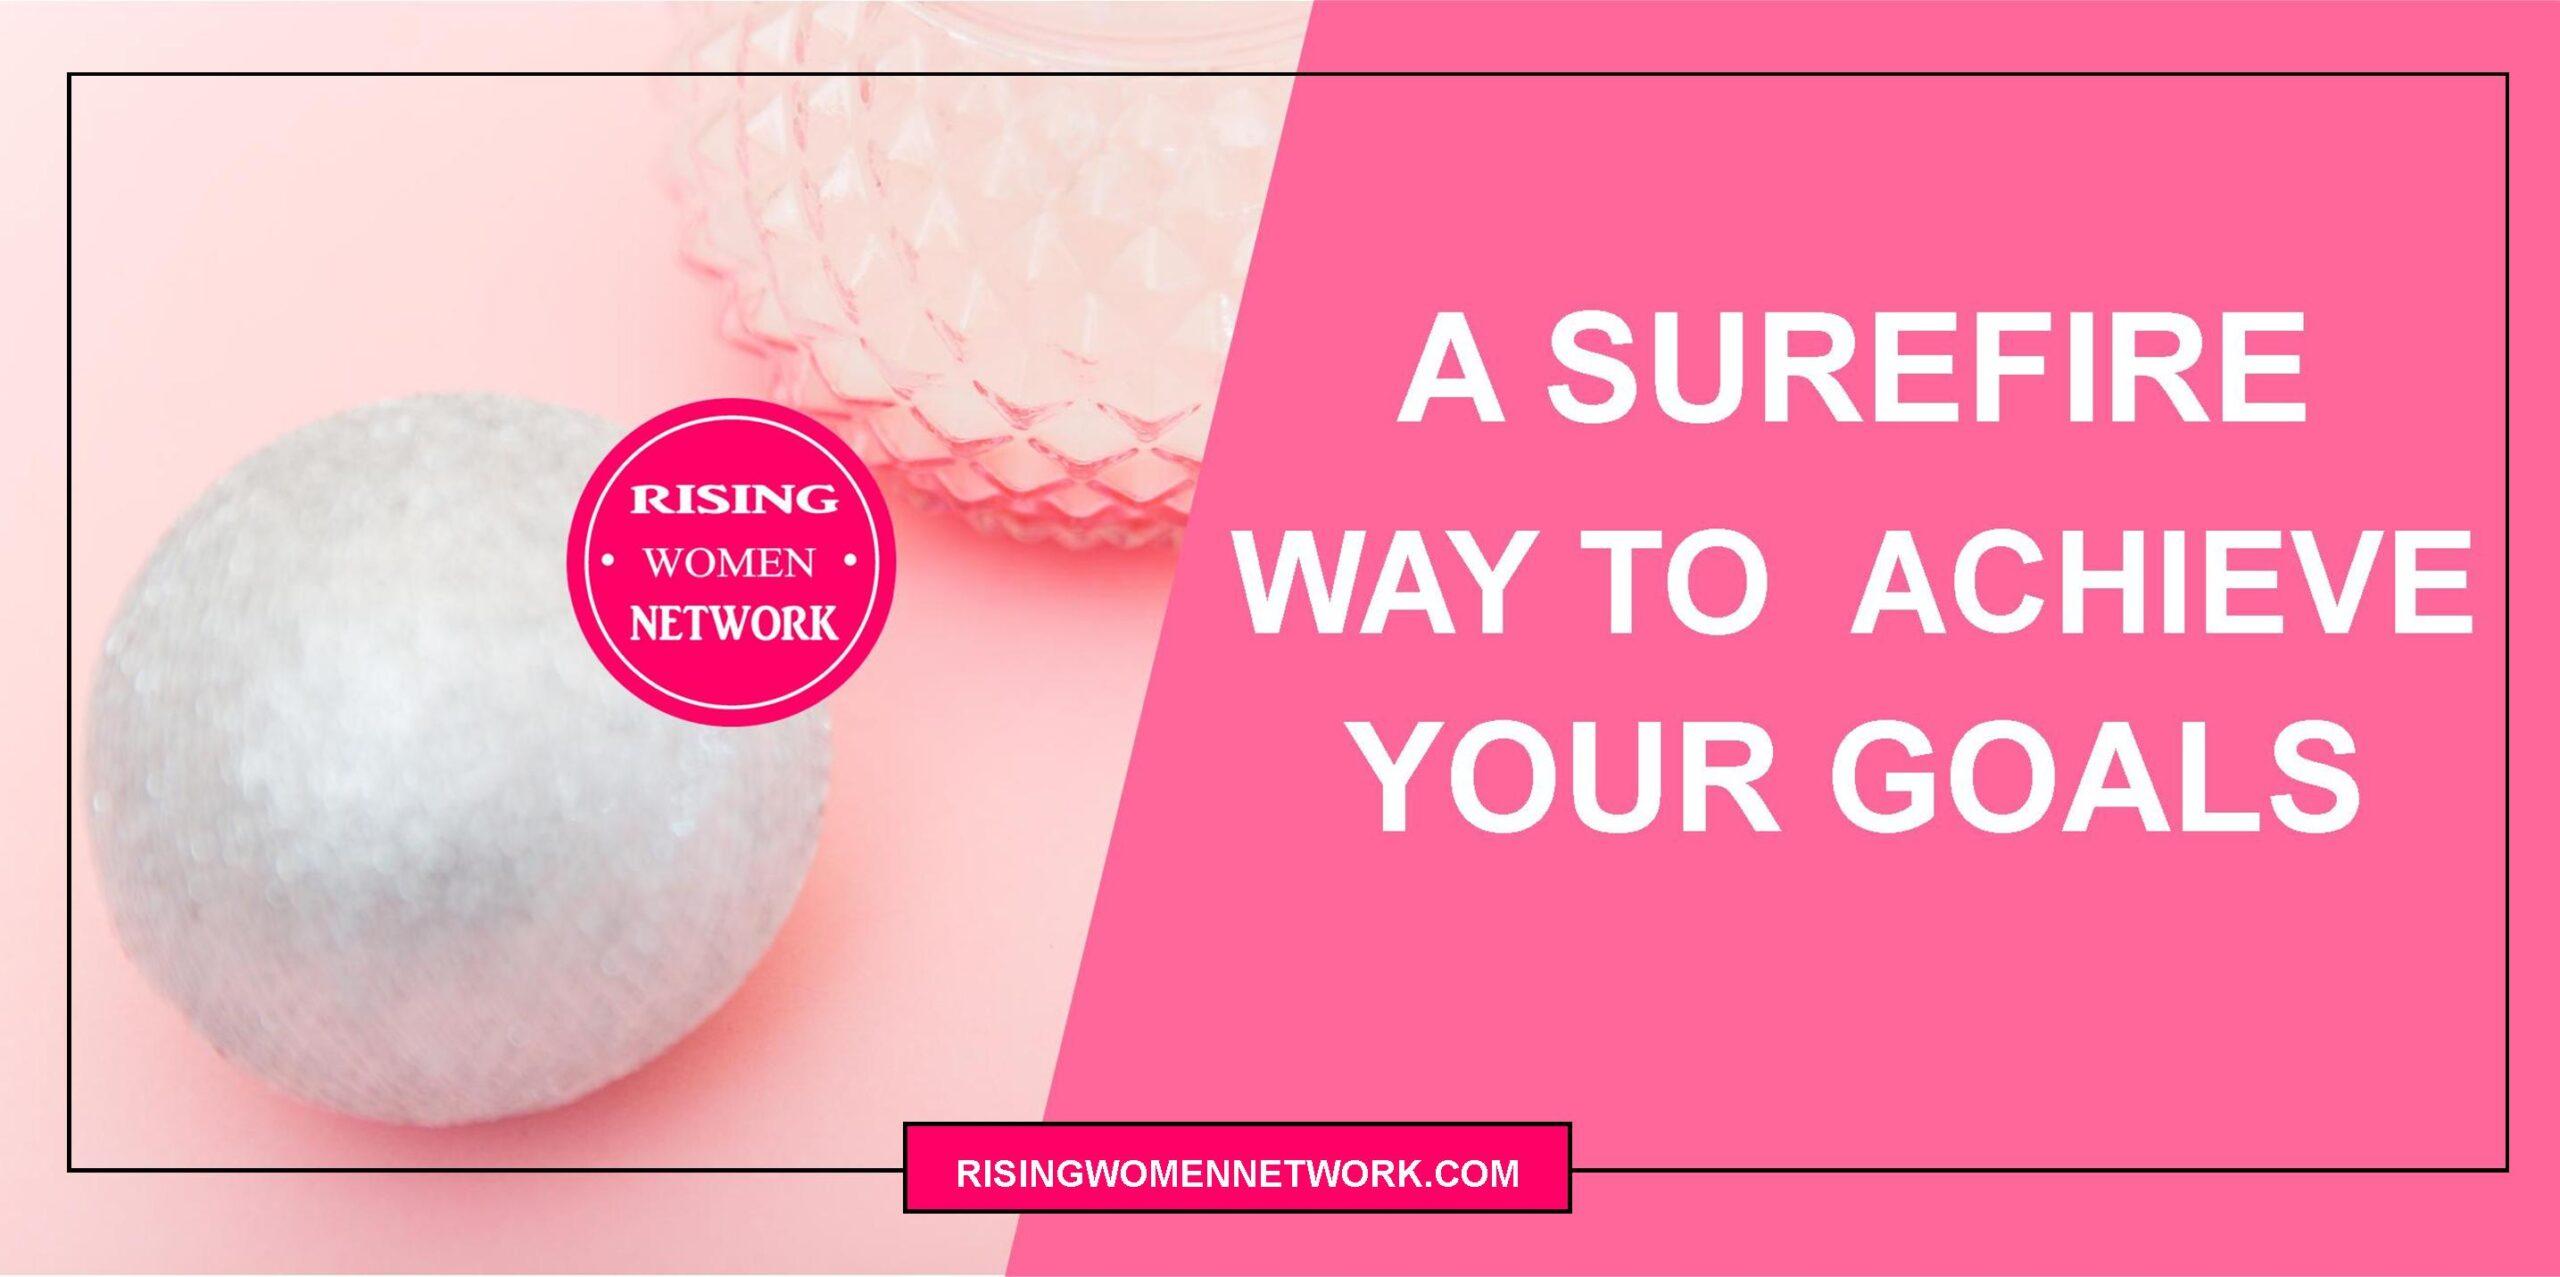 A Surefire Way to Achieve Your Goals